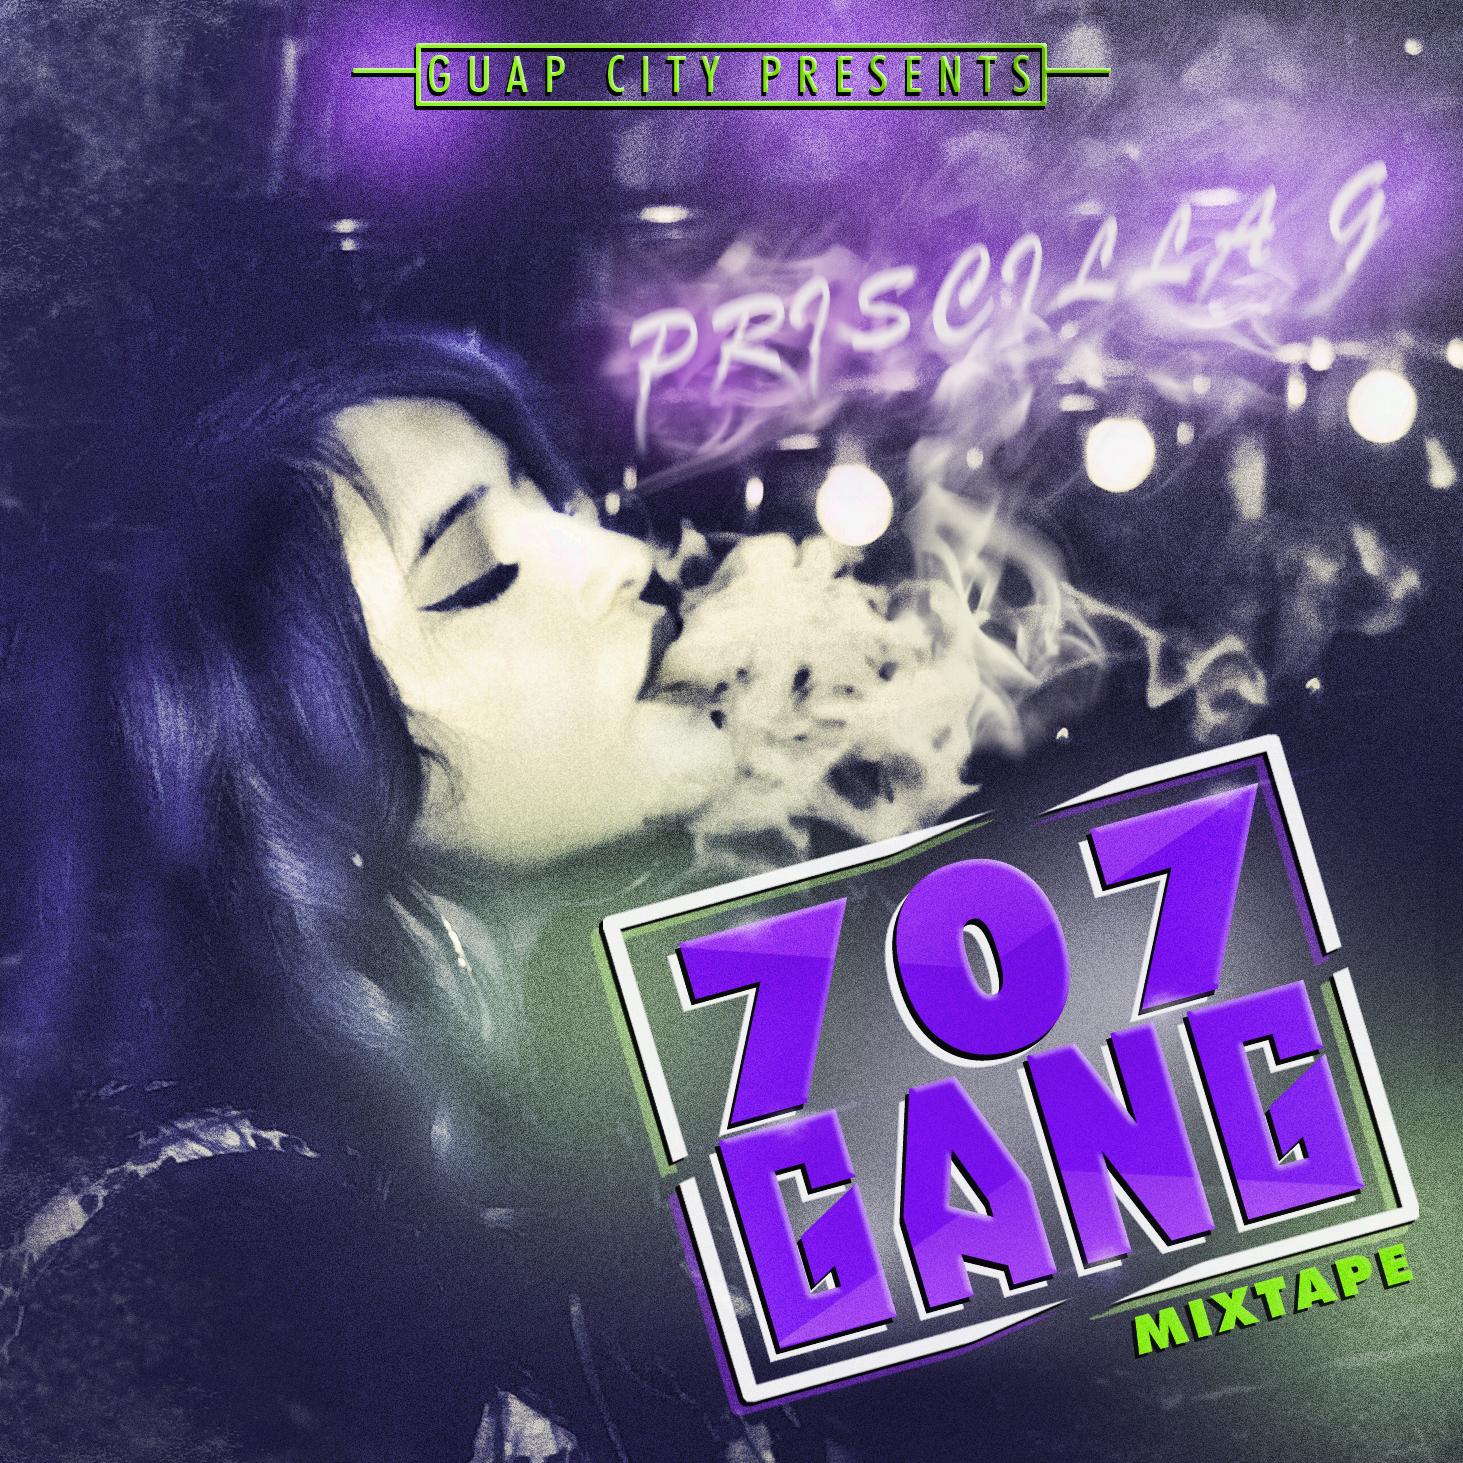 707 Gang mixtape.jpg